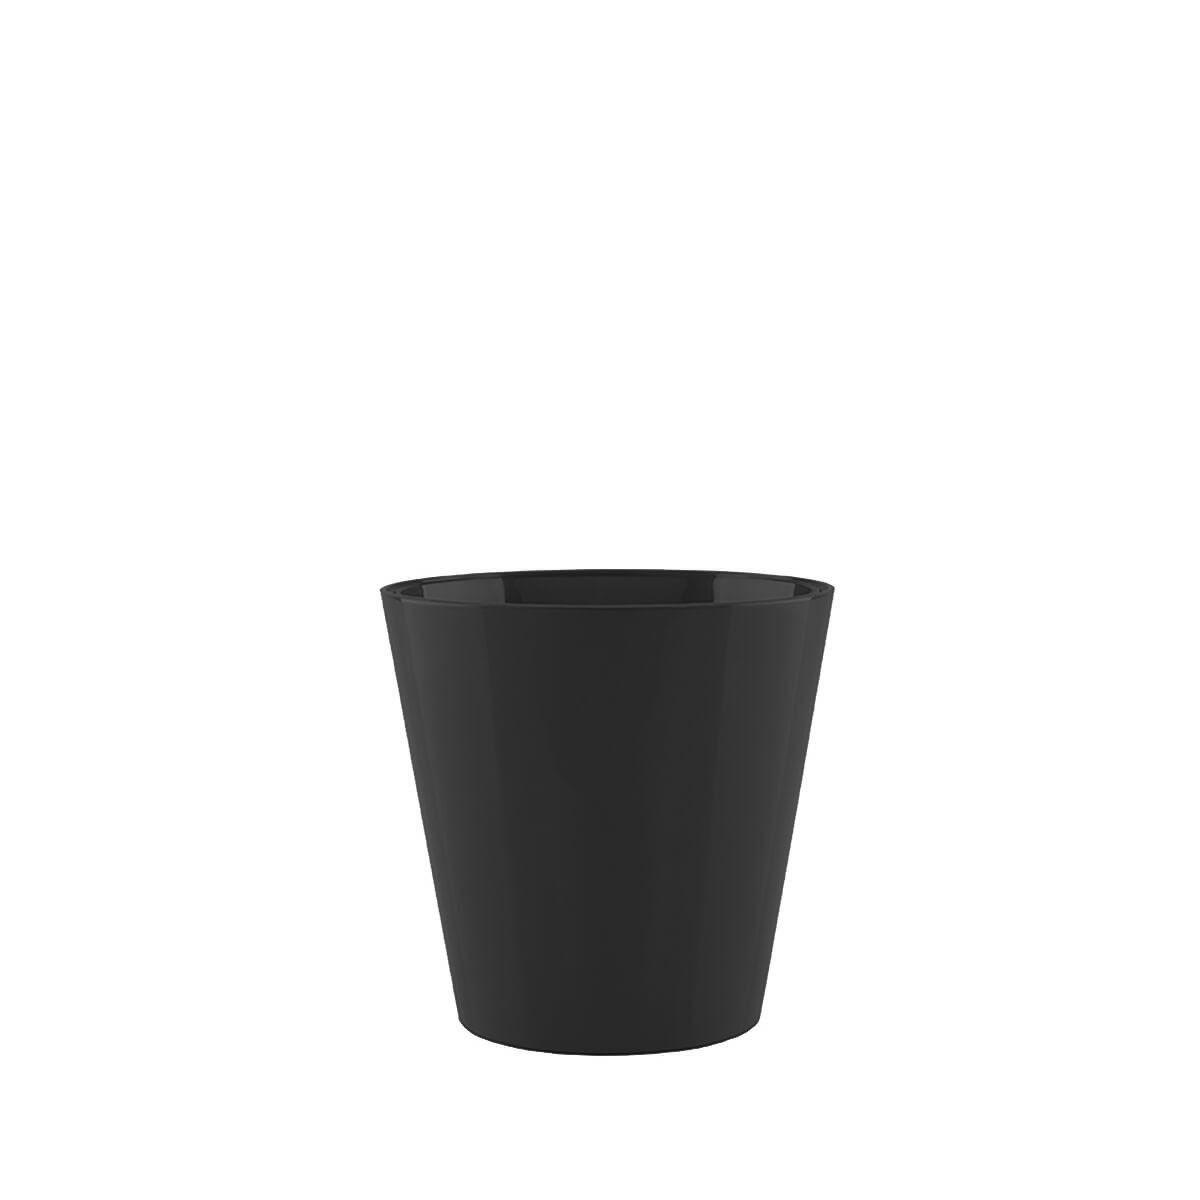 Vaso Porto Alto 13 x 15 cm Vasart